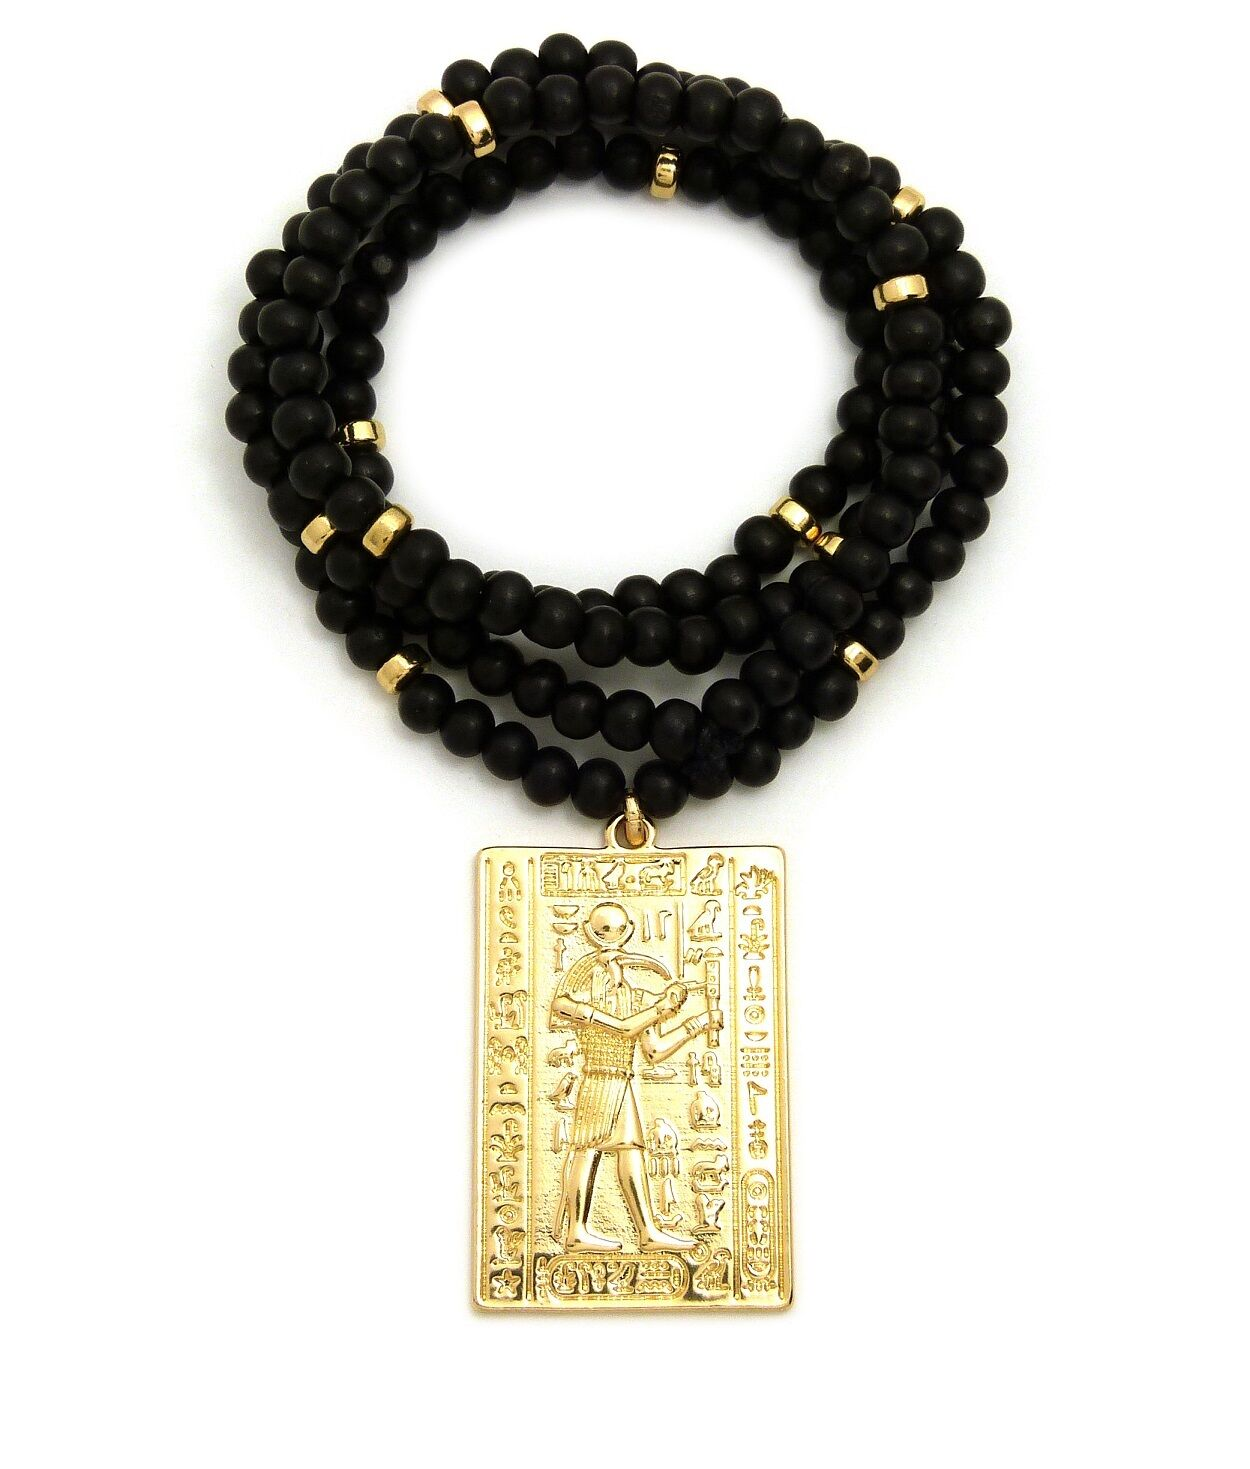 "Egyptian Ancient Hieroglyphic Alphabet Thoth Pendant 6mm 30"""